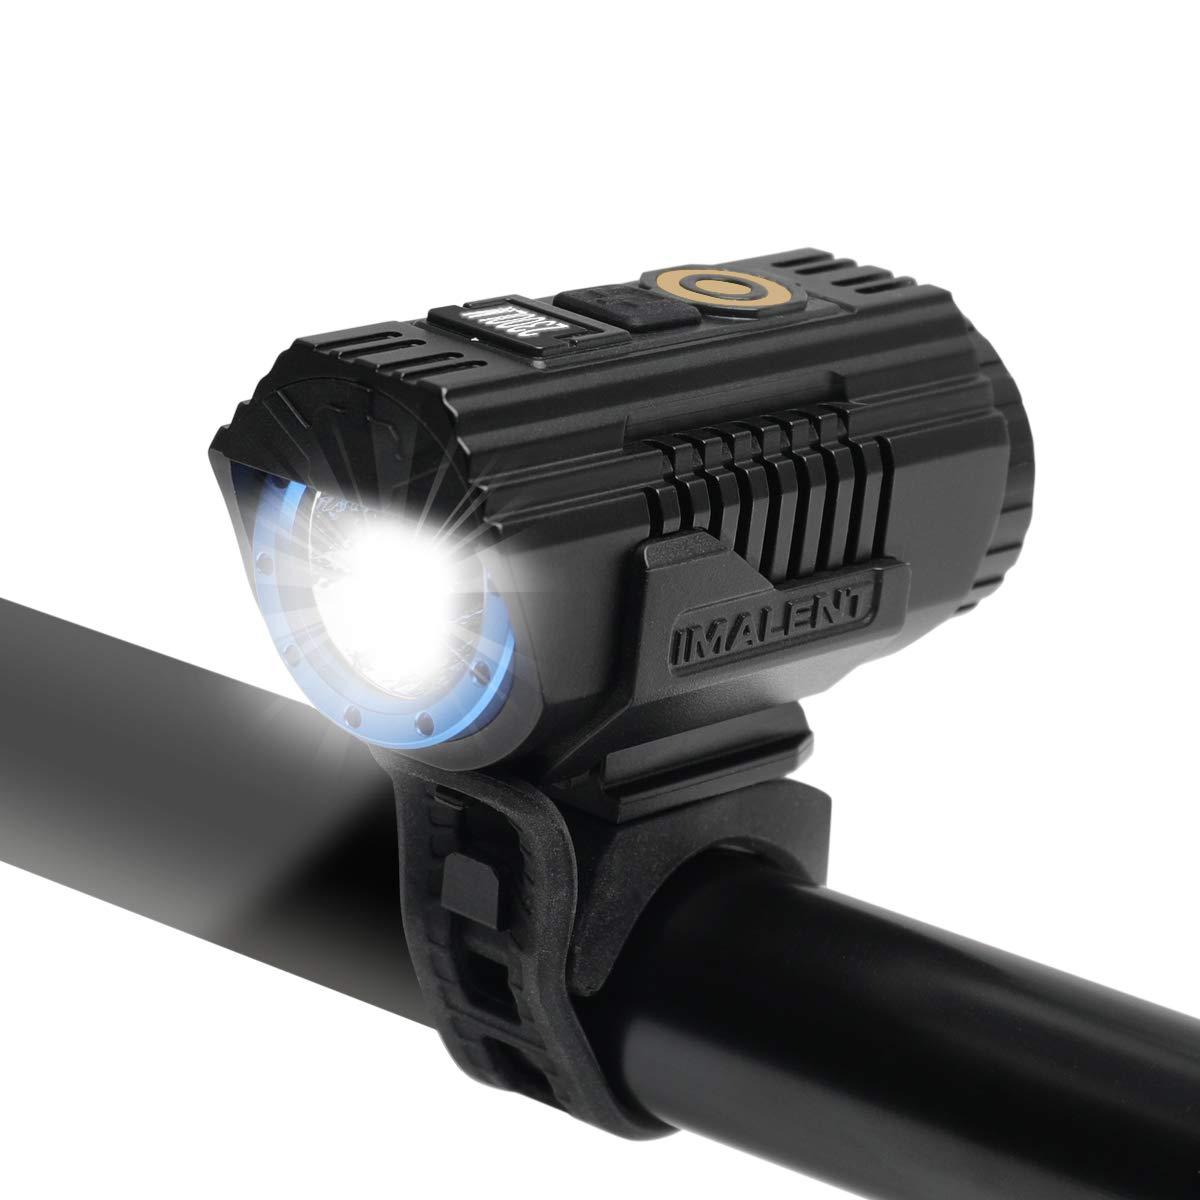 IMALENT BG10 2300 Lumens USB Magnetic Rechargeable Bike Light CREE XHP50 2nd Generation Durable IPX-8 Waterproof Cycling Flashlight